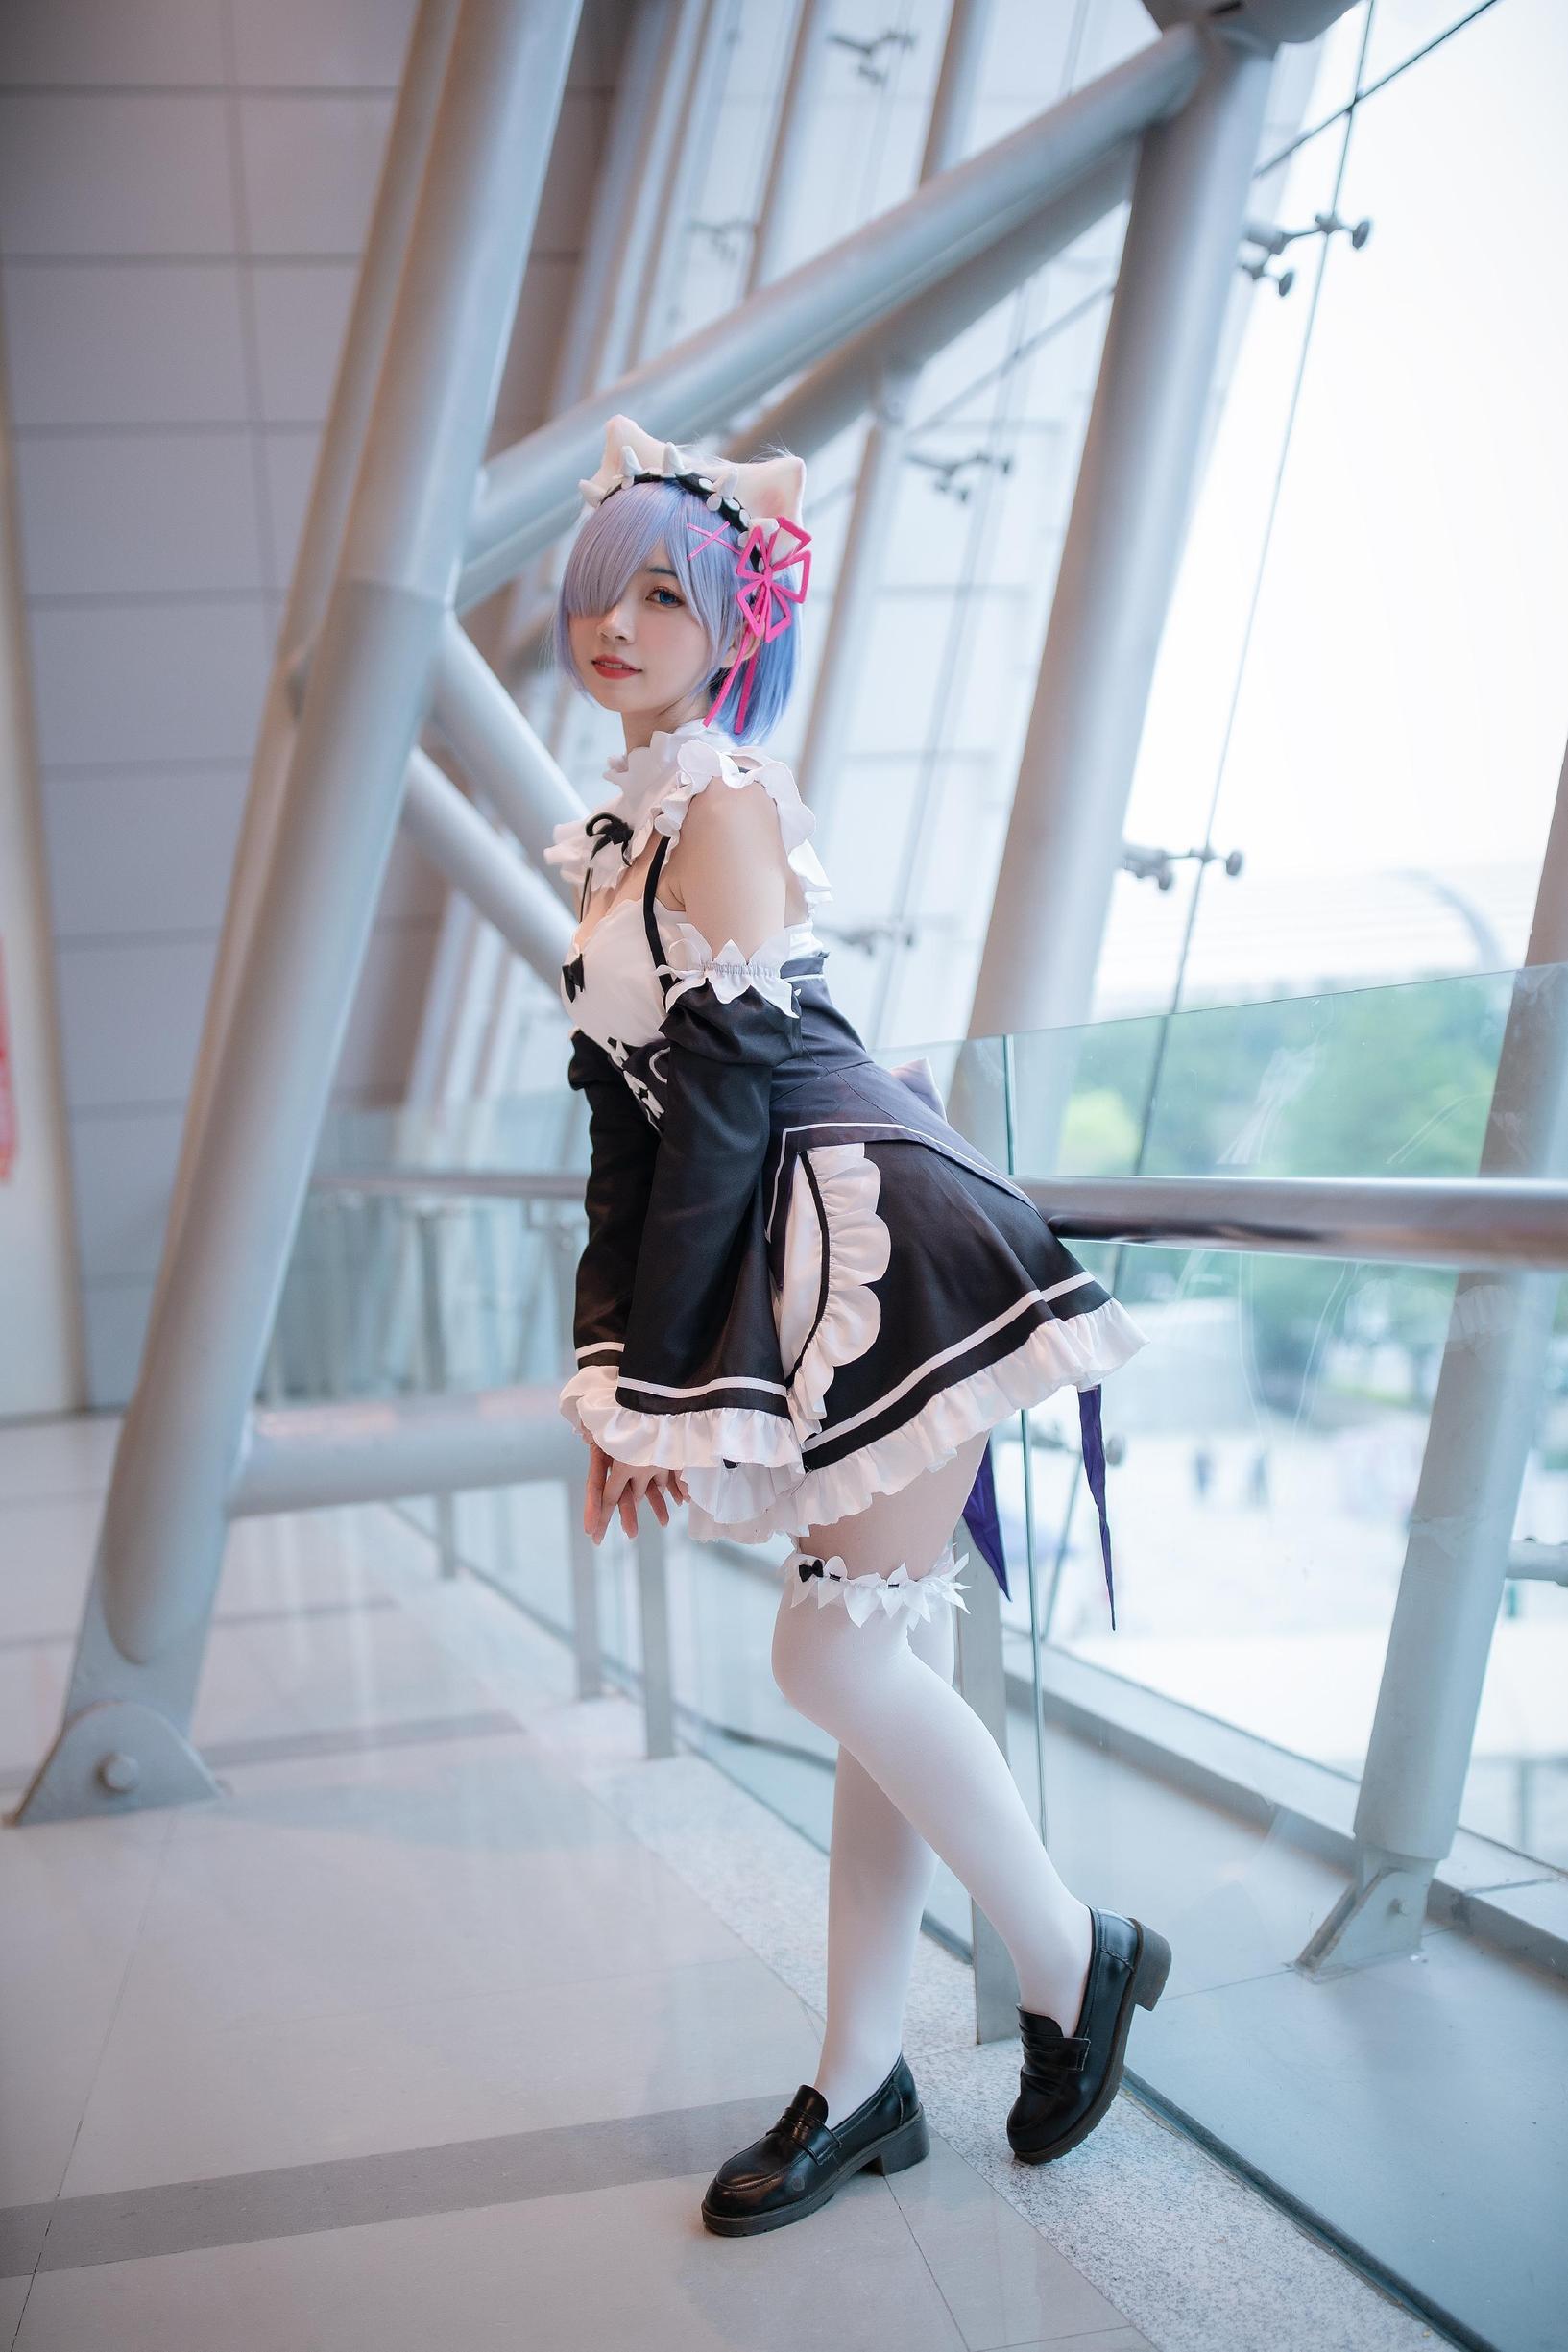 《RE:从零开始的异世界生活》可爱cosplay【CN:铅华wr】-第3张